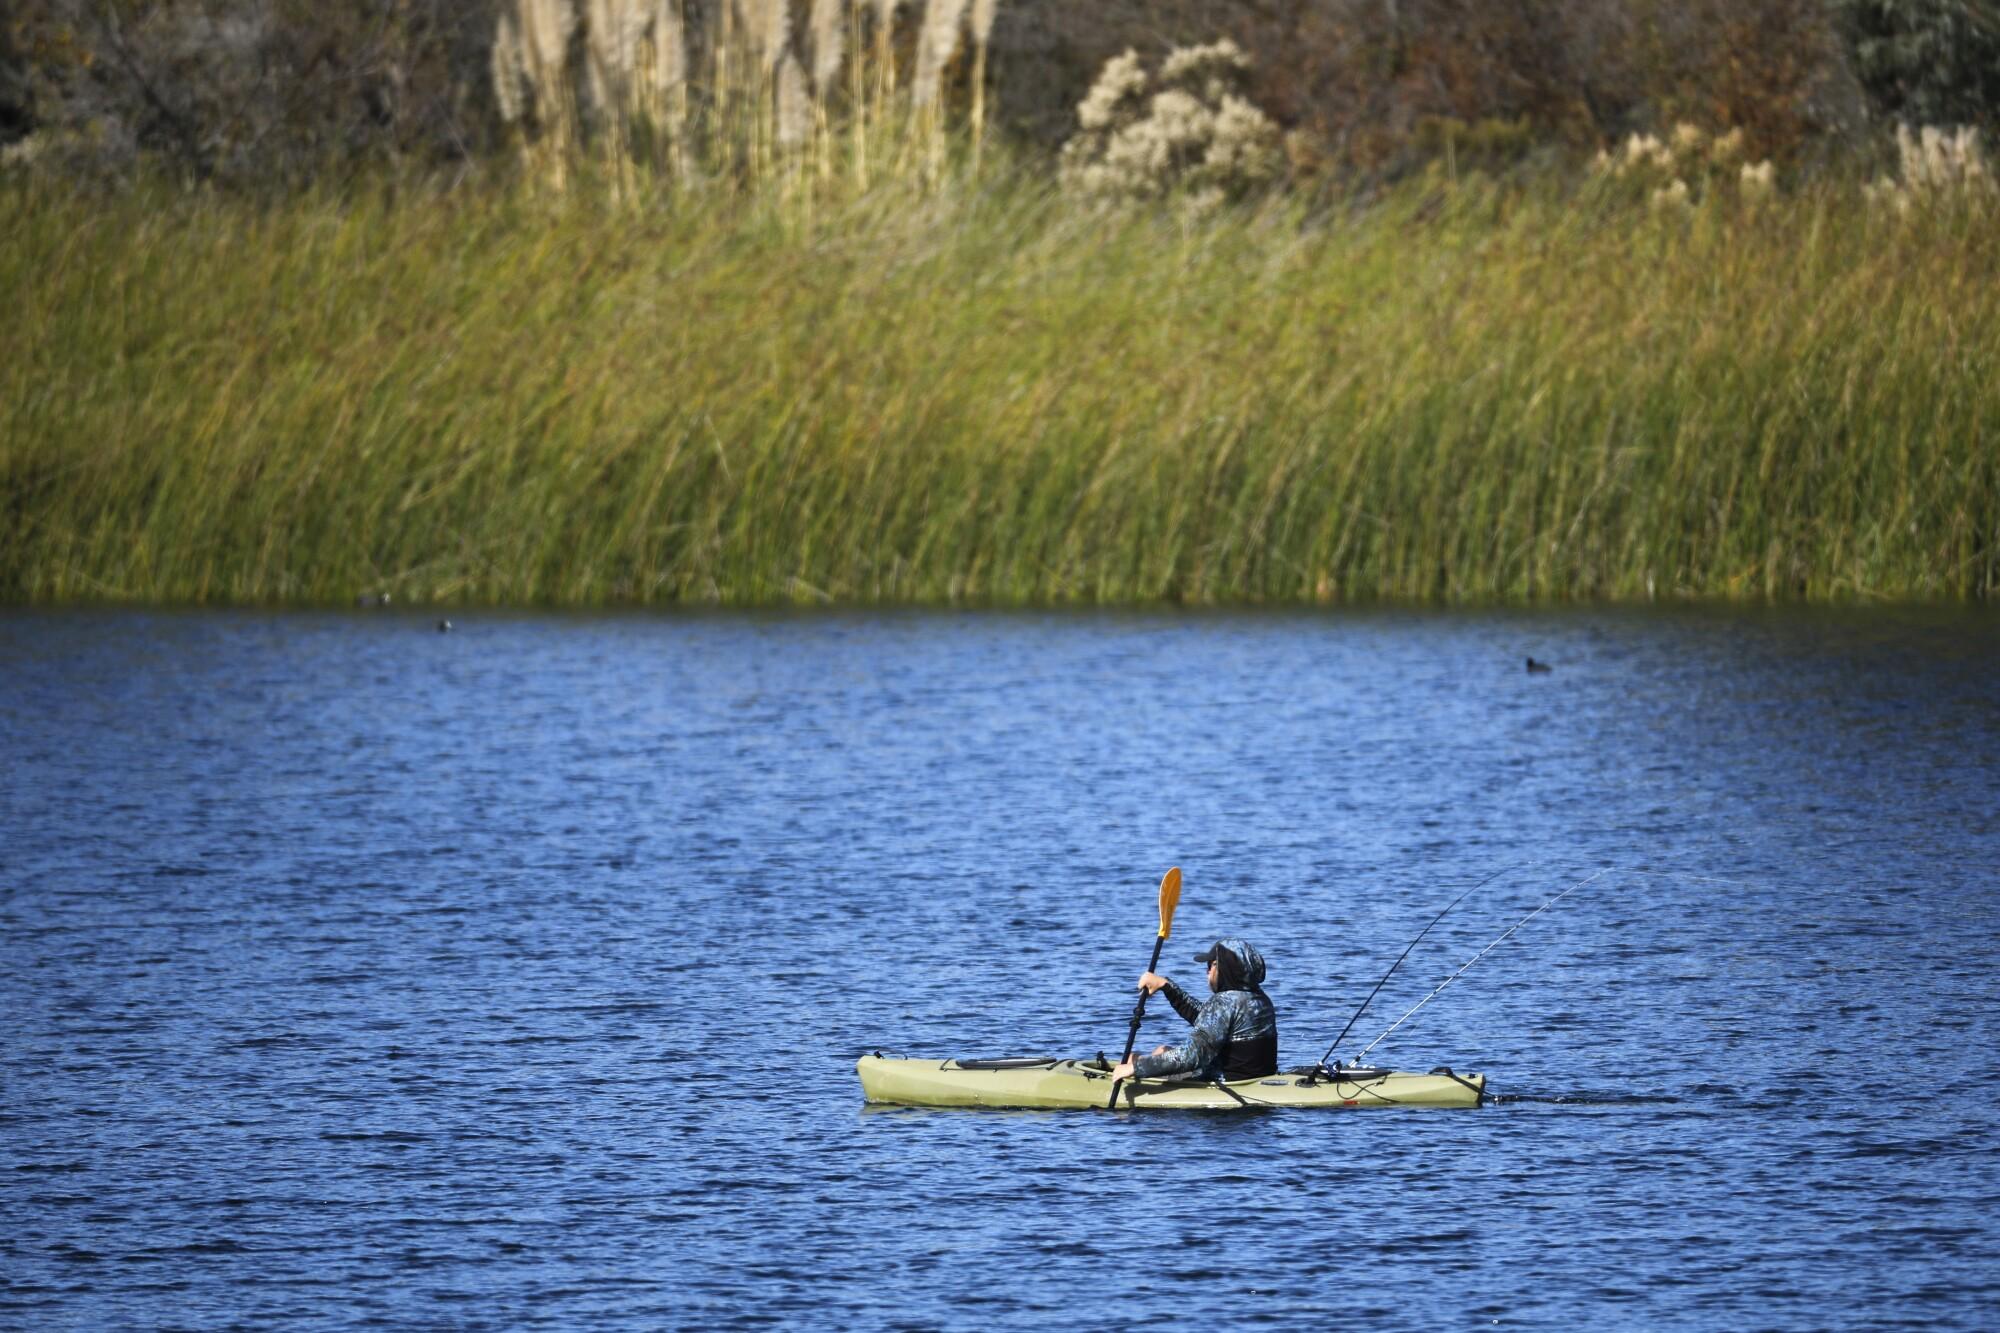 Justin Brackett kayaks along as he fishes on a hot morning in Miramar Reservoir.